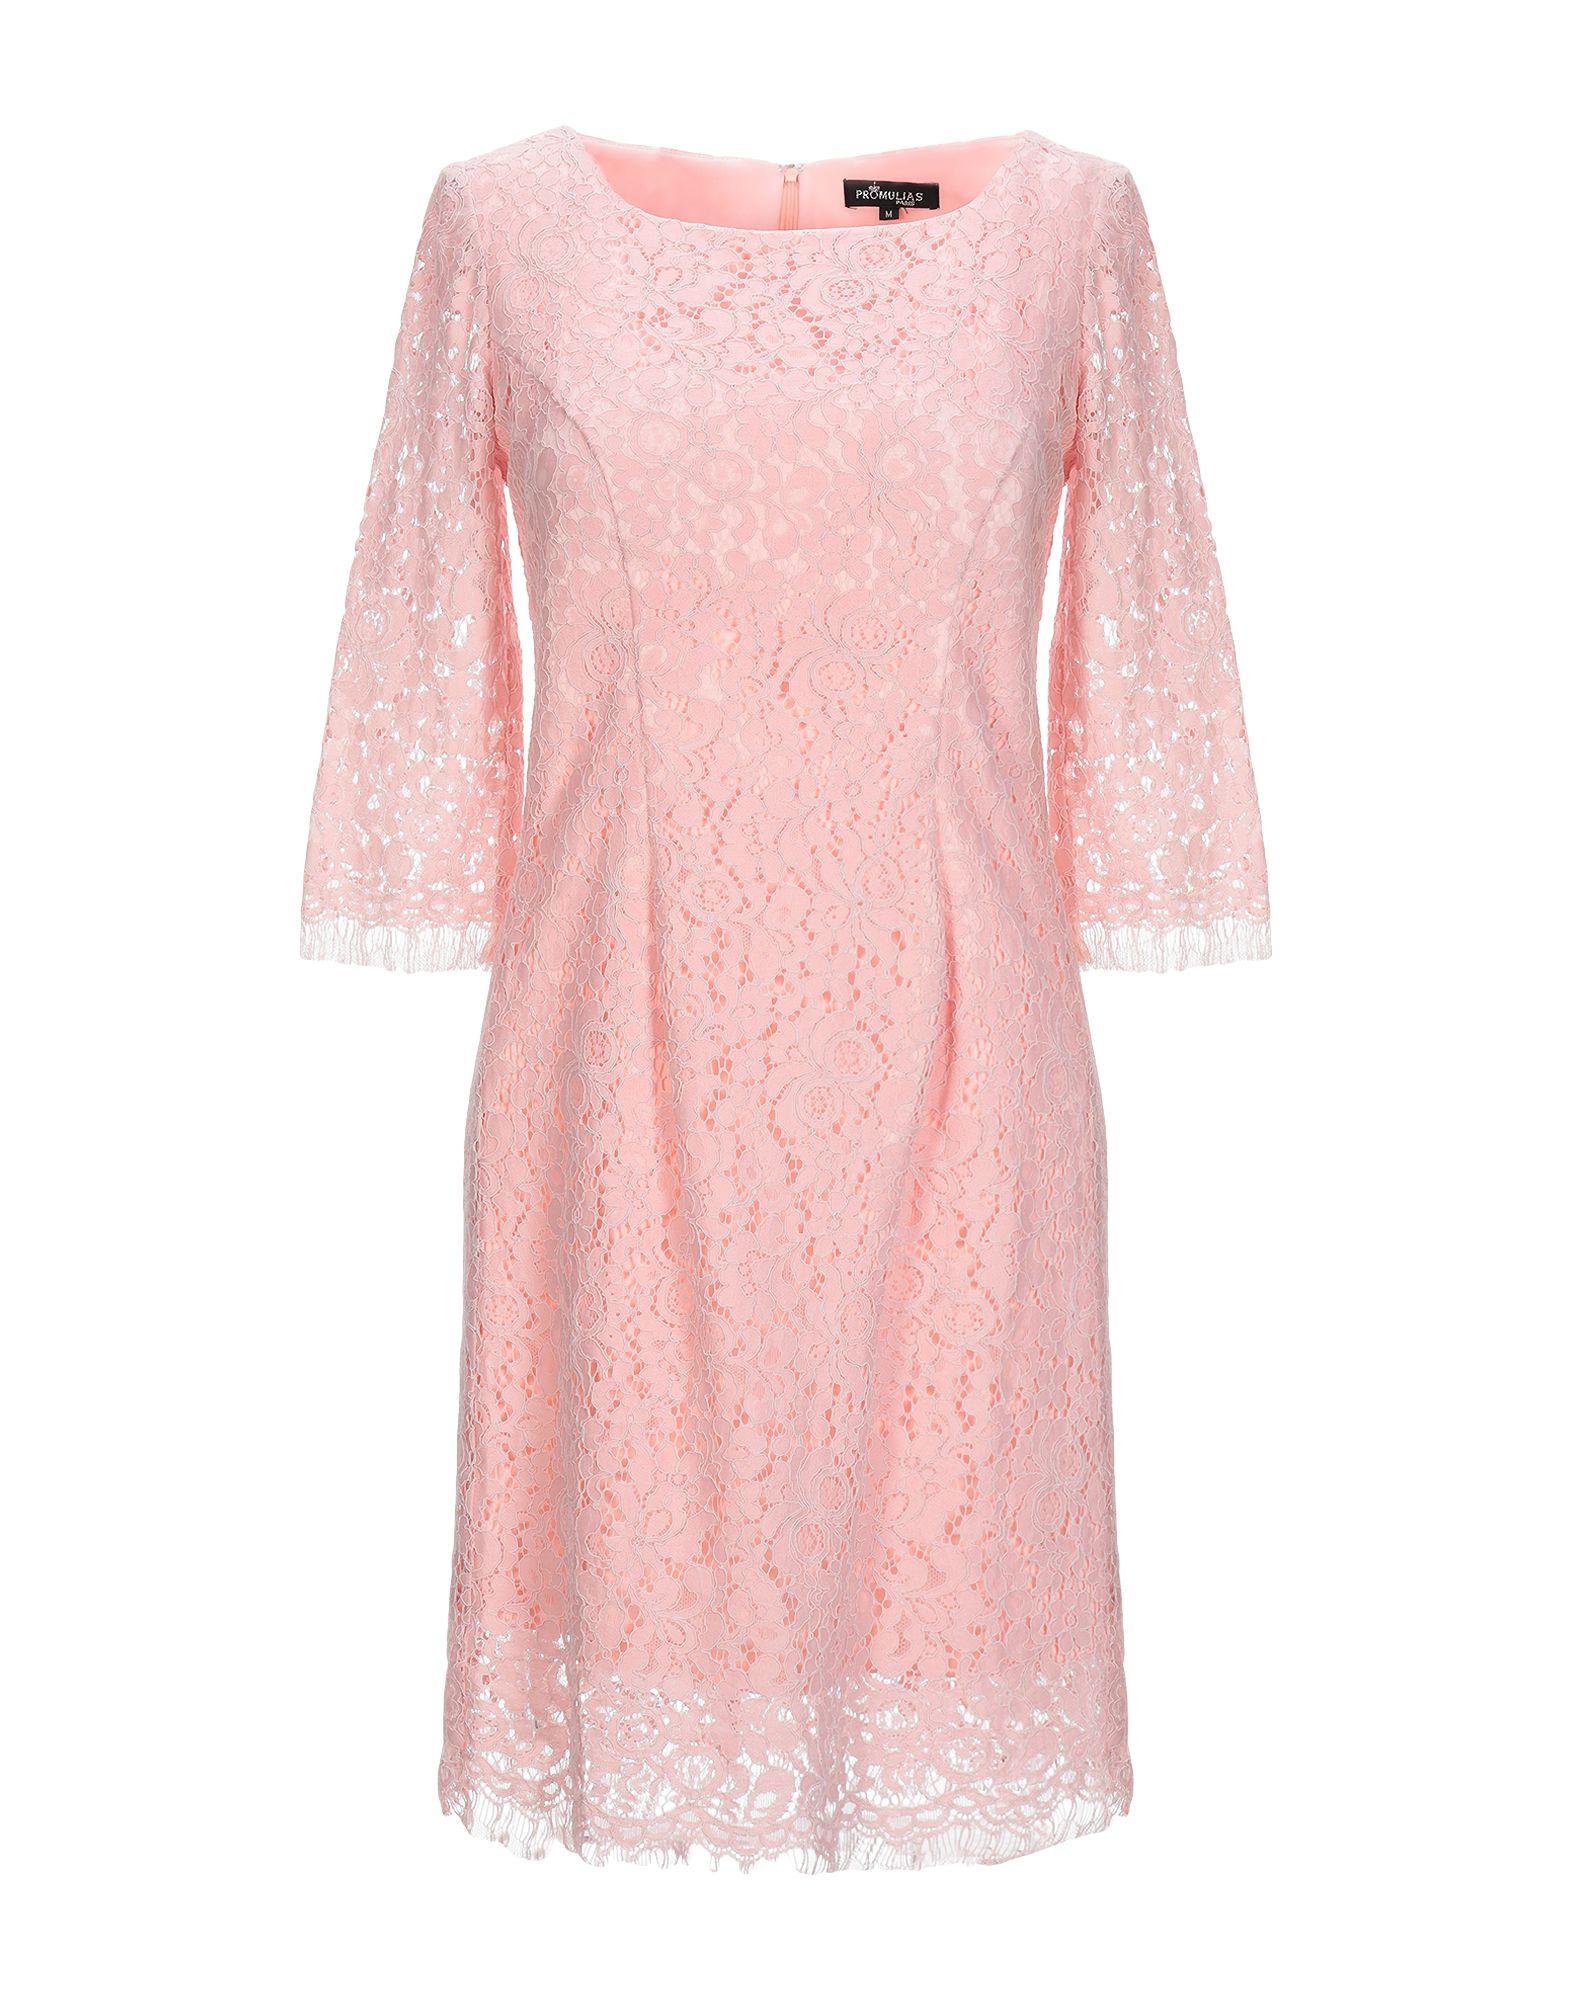 PROMULIAS PARIS Короткое платье